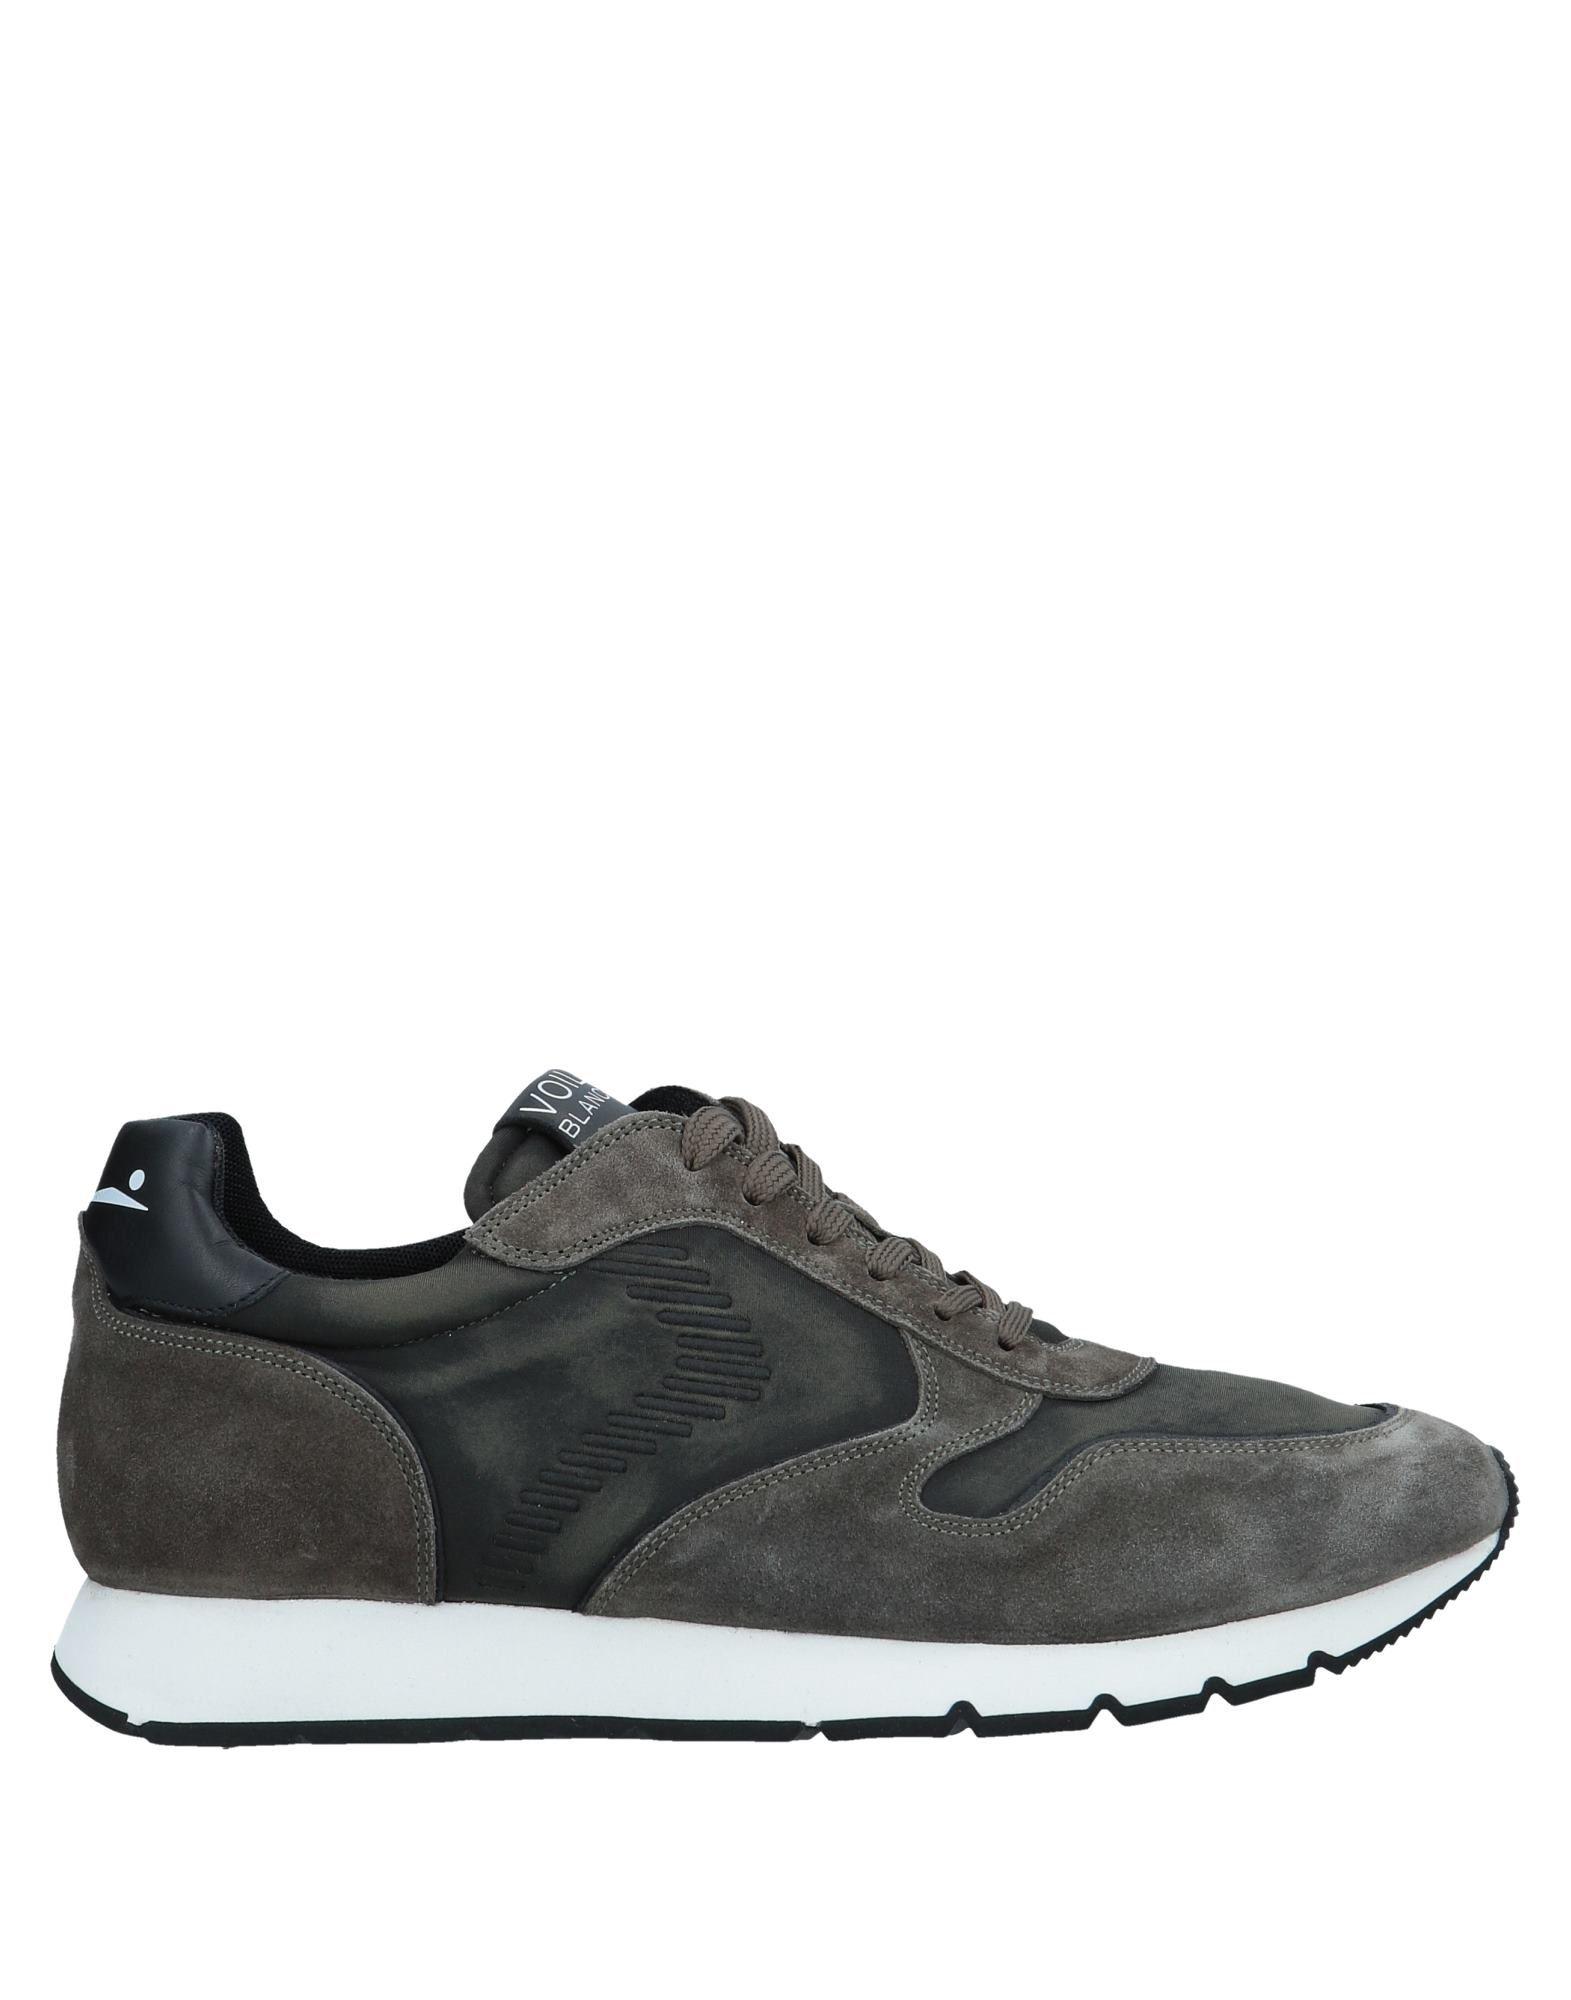 VOILE BLANCHE Sneakers in Dark Green